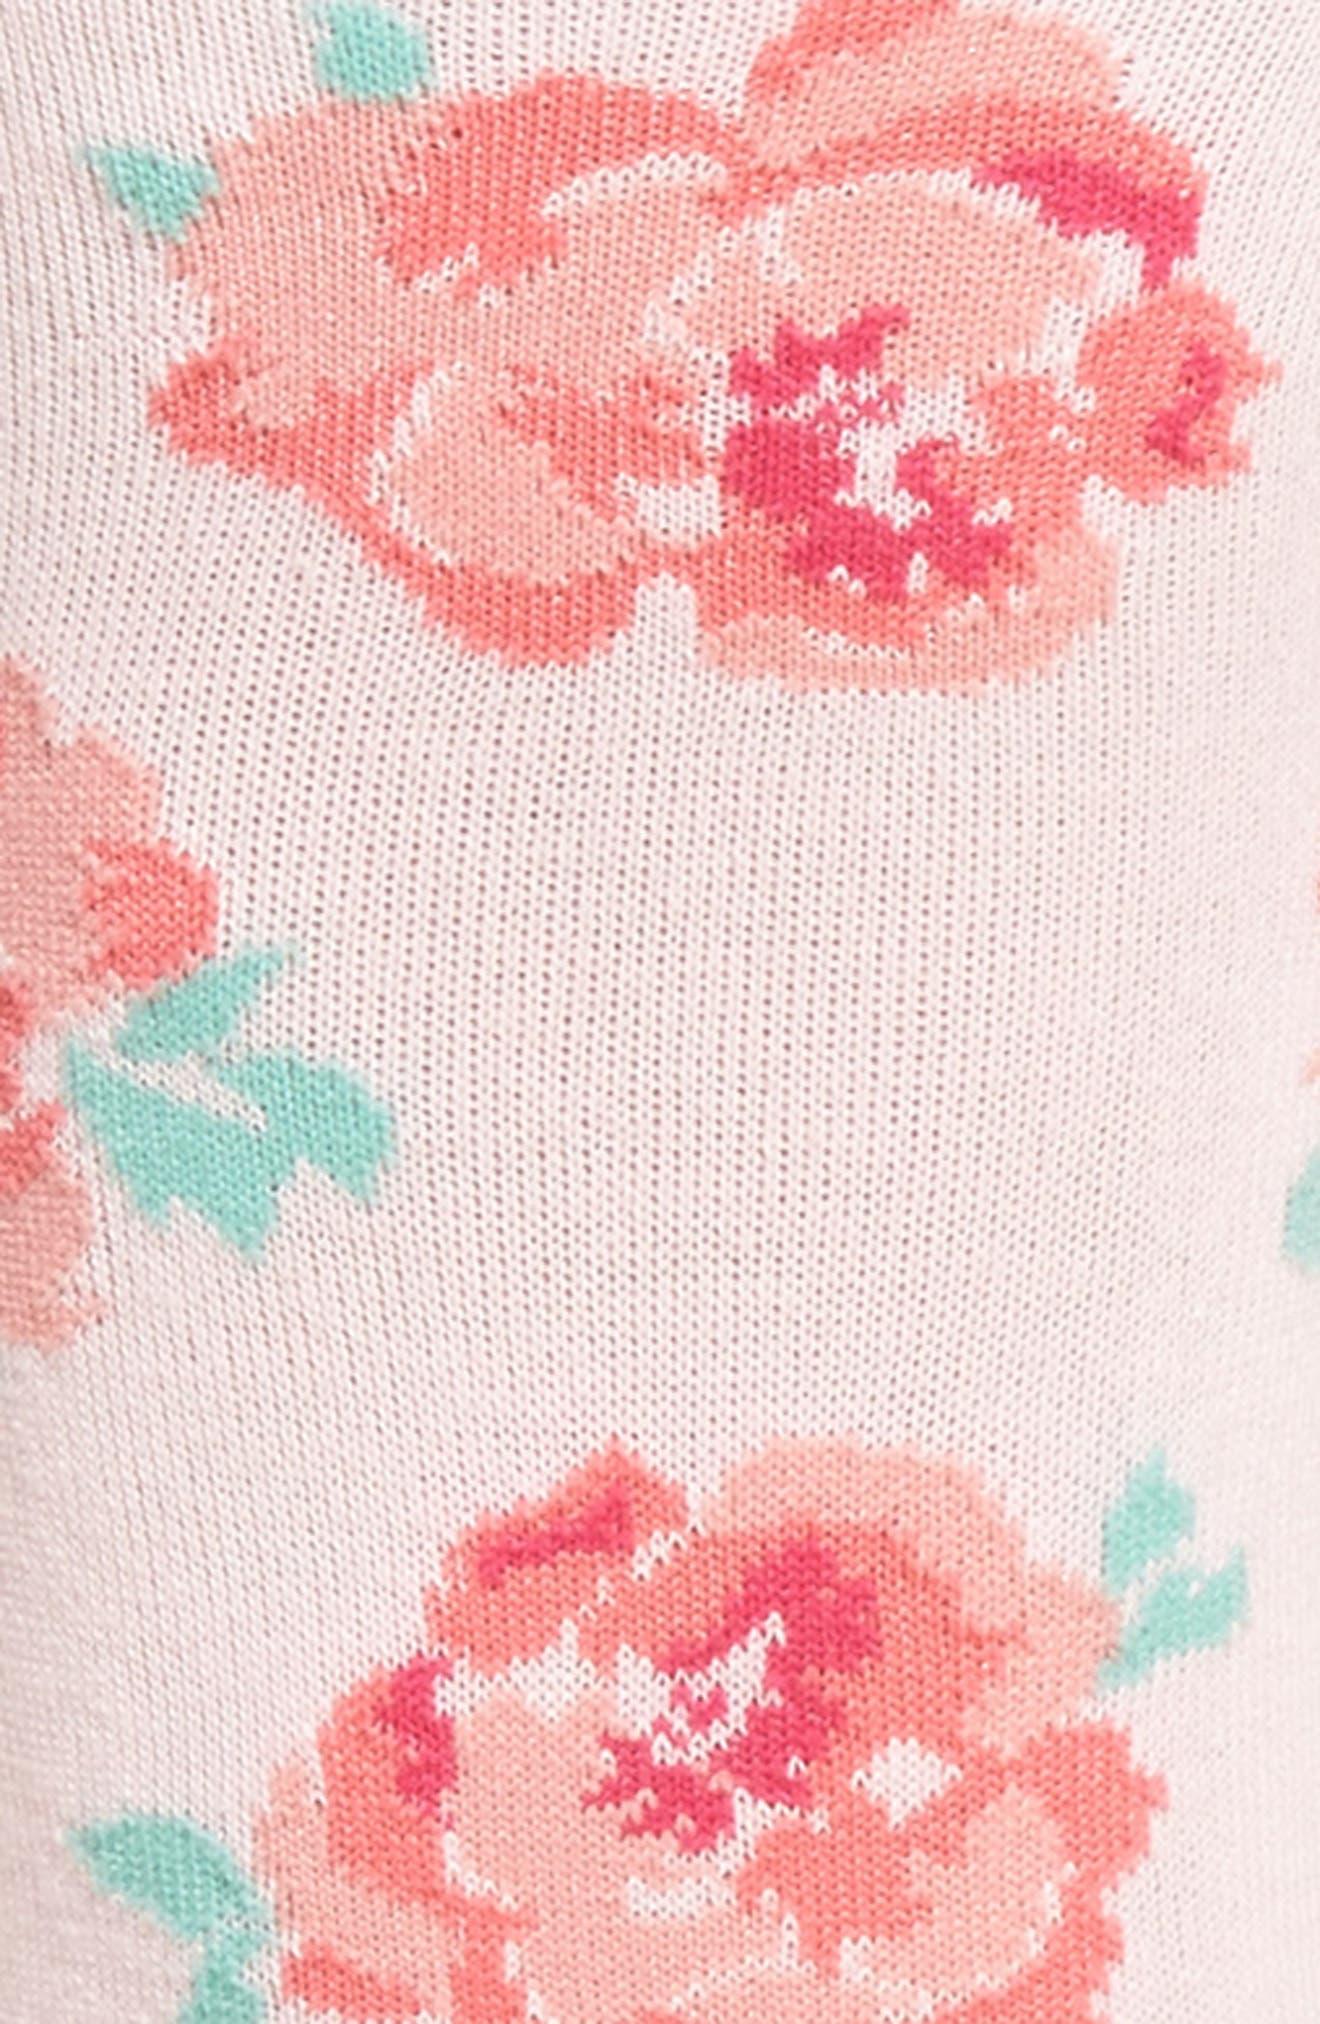 Bride Crew Socks,                             Alternate thumbnail 3, color,                             680